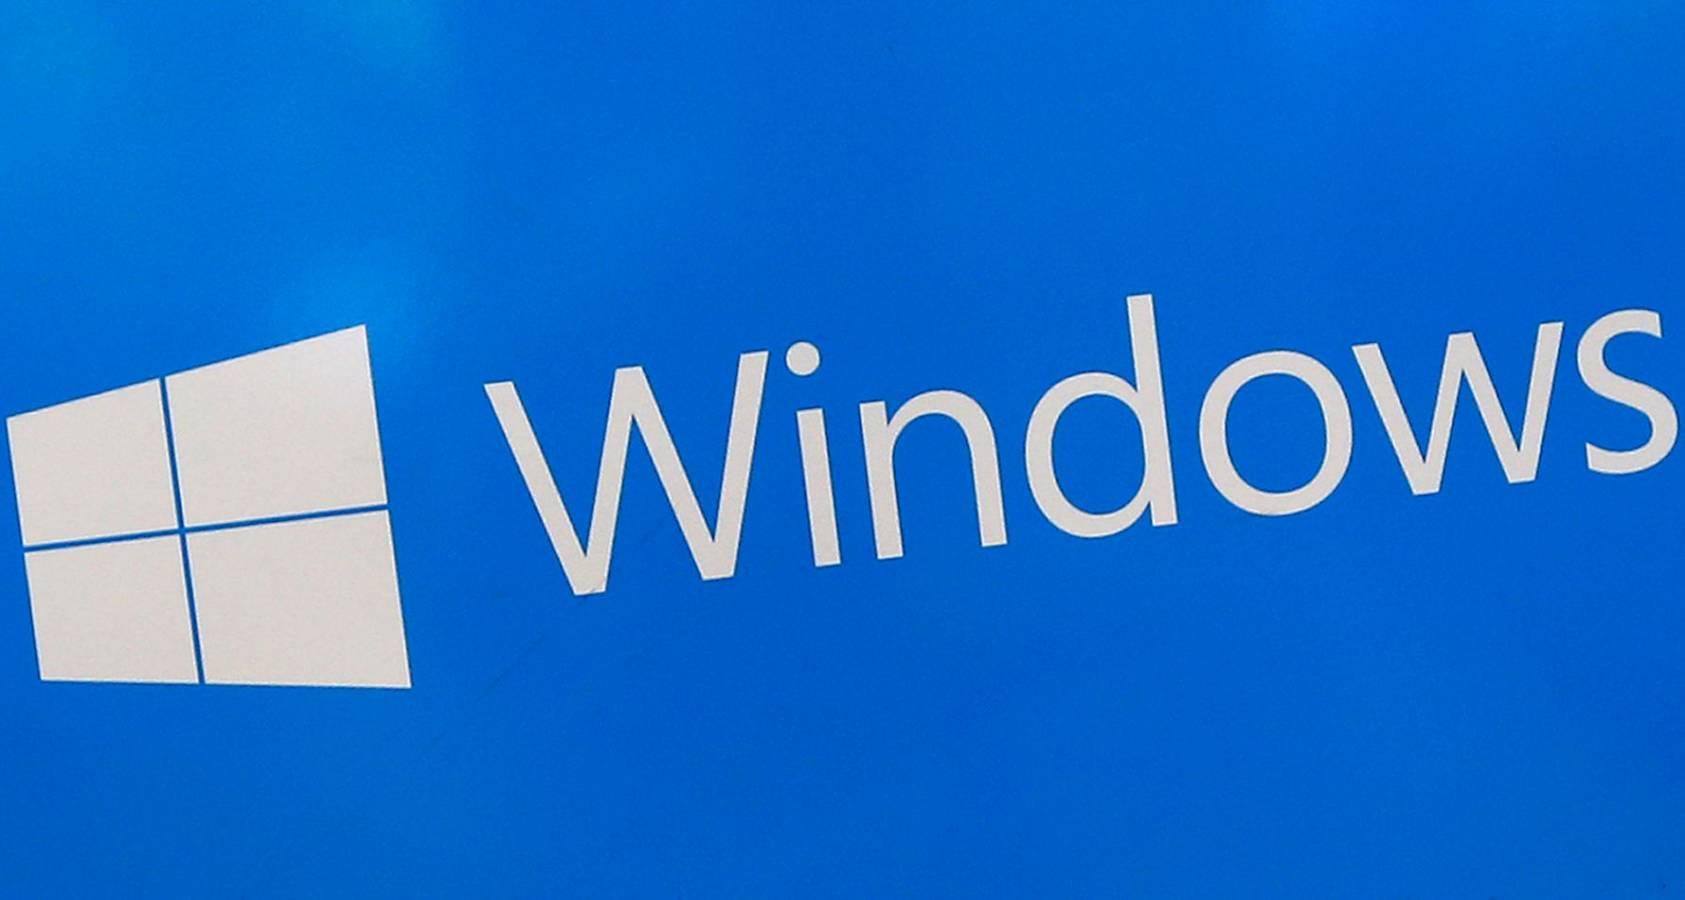 Windows 10 hotarare radicala